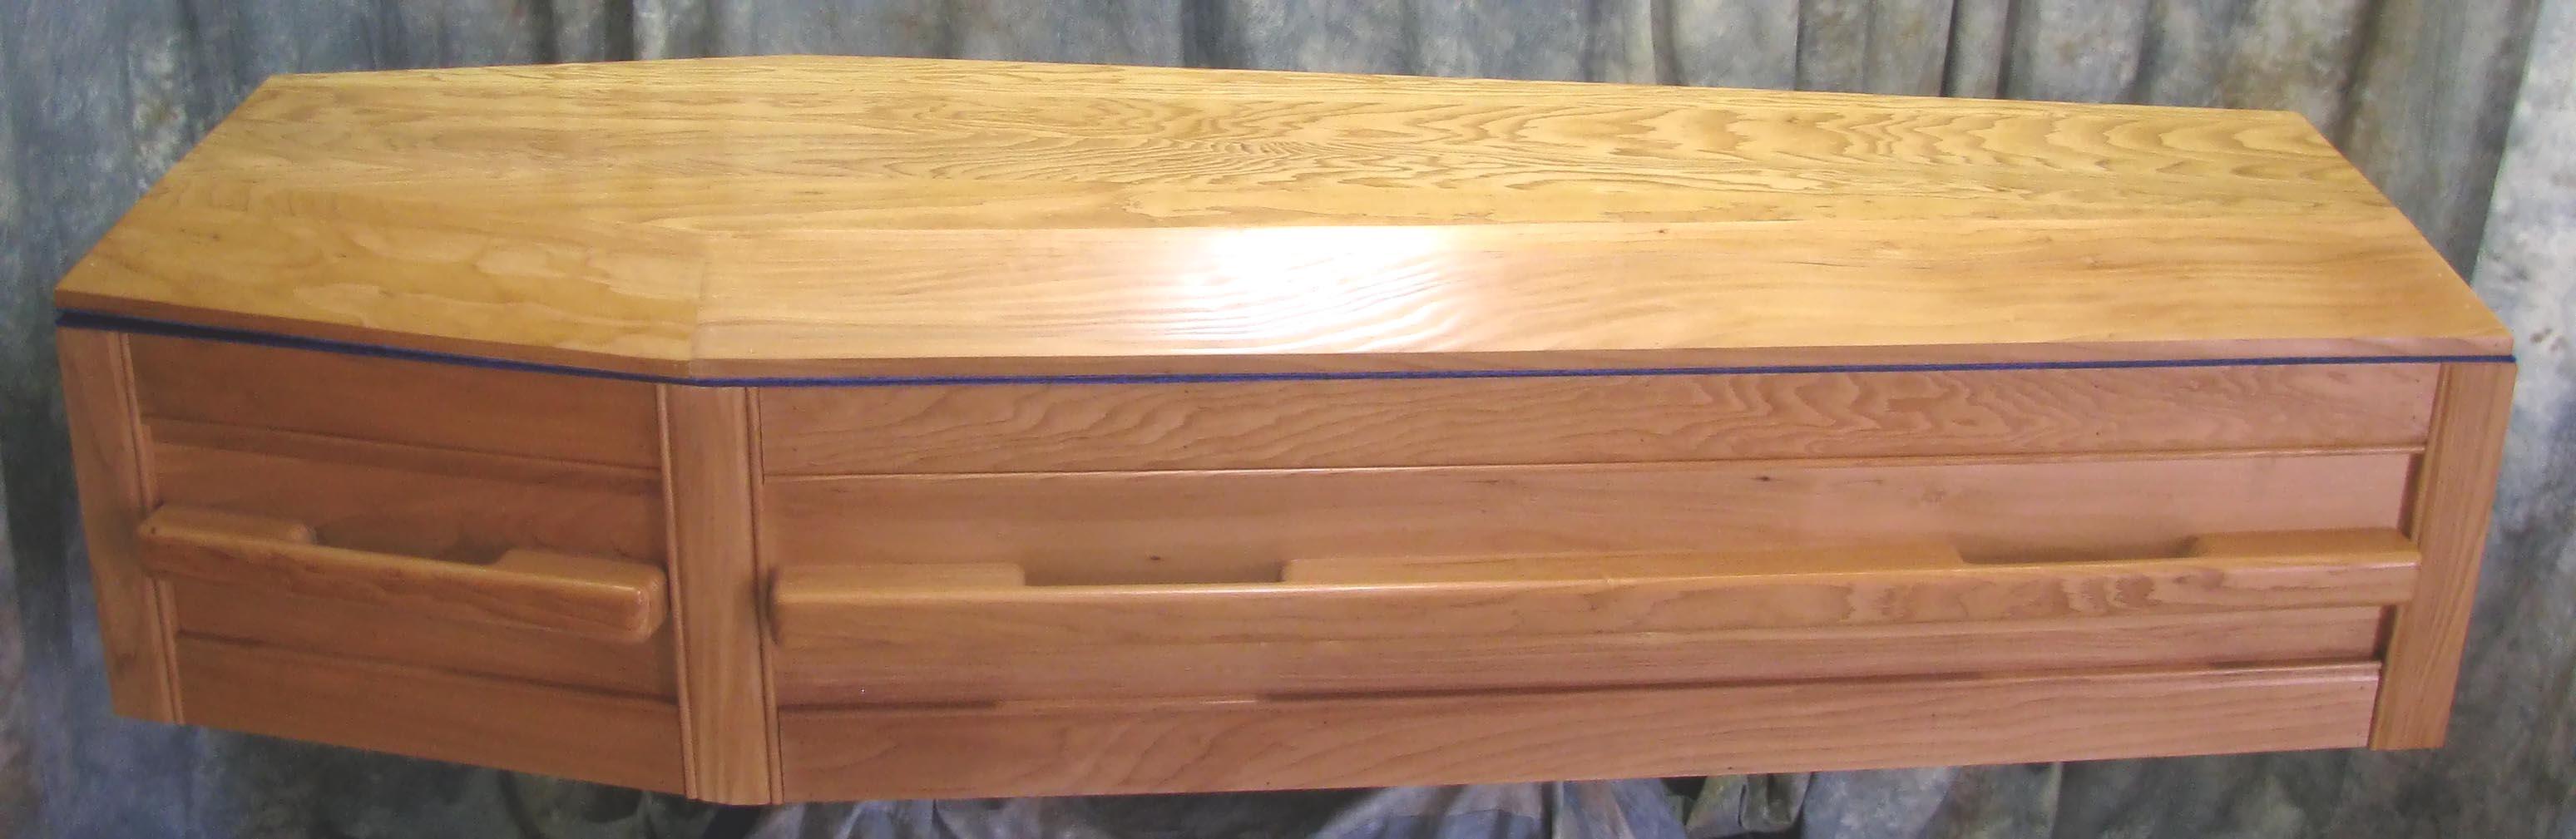 coffin%201363.jpg